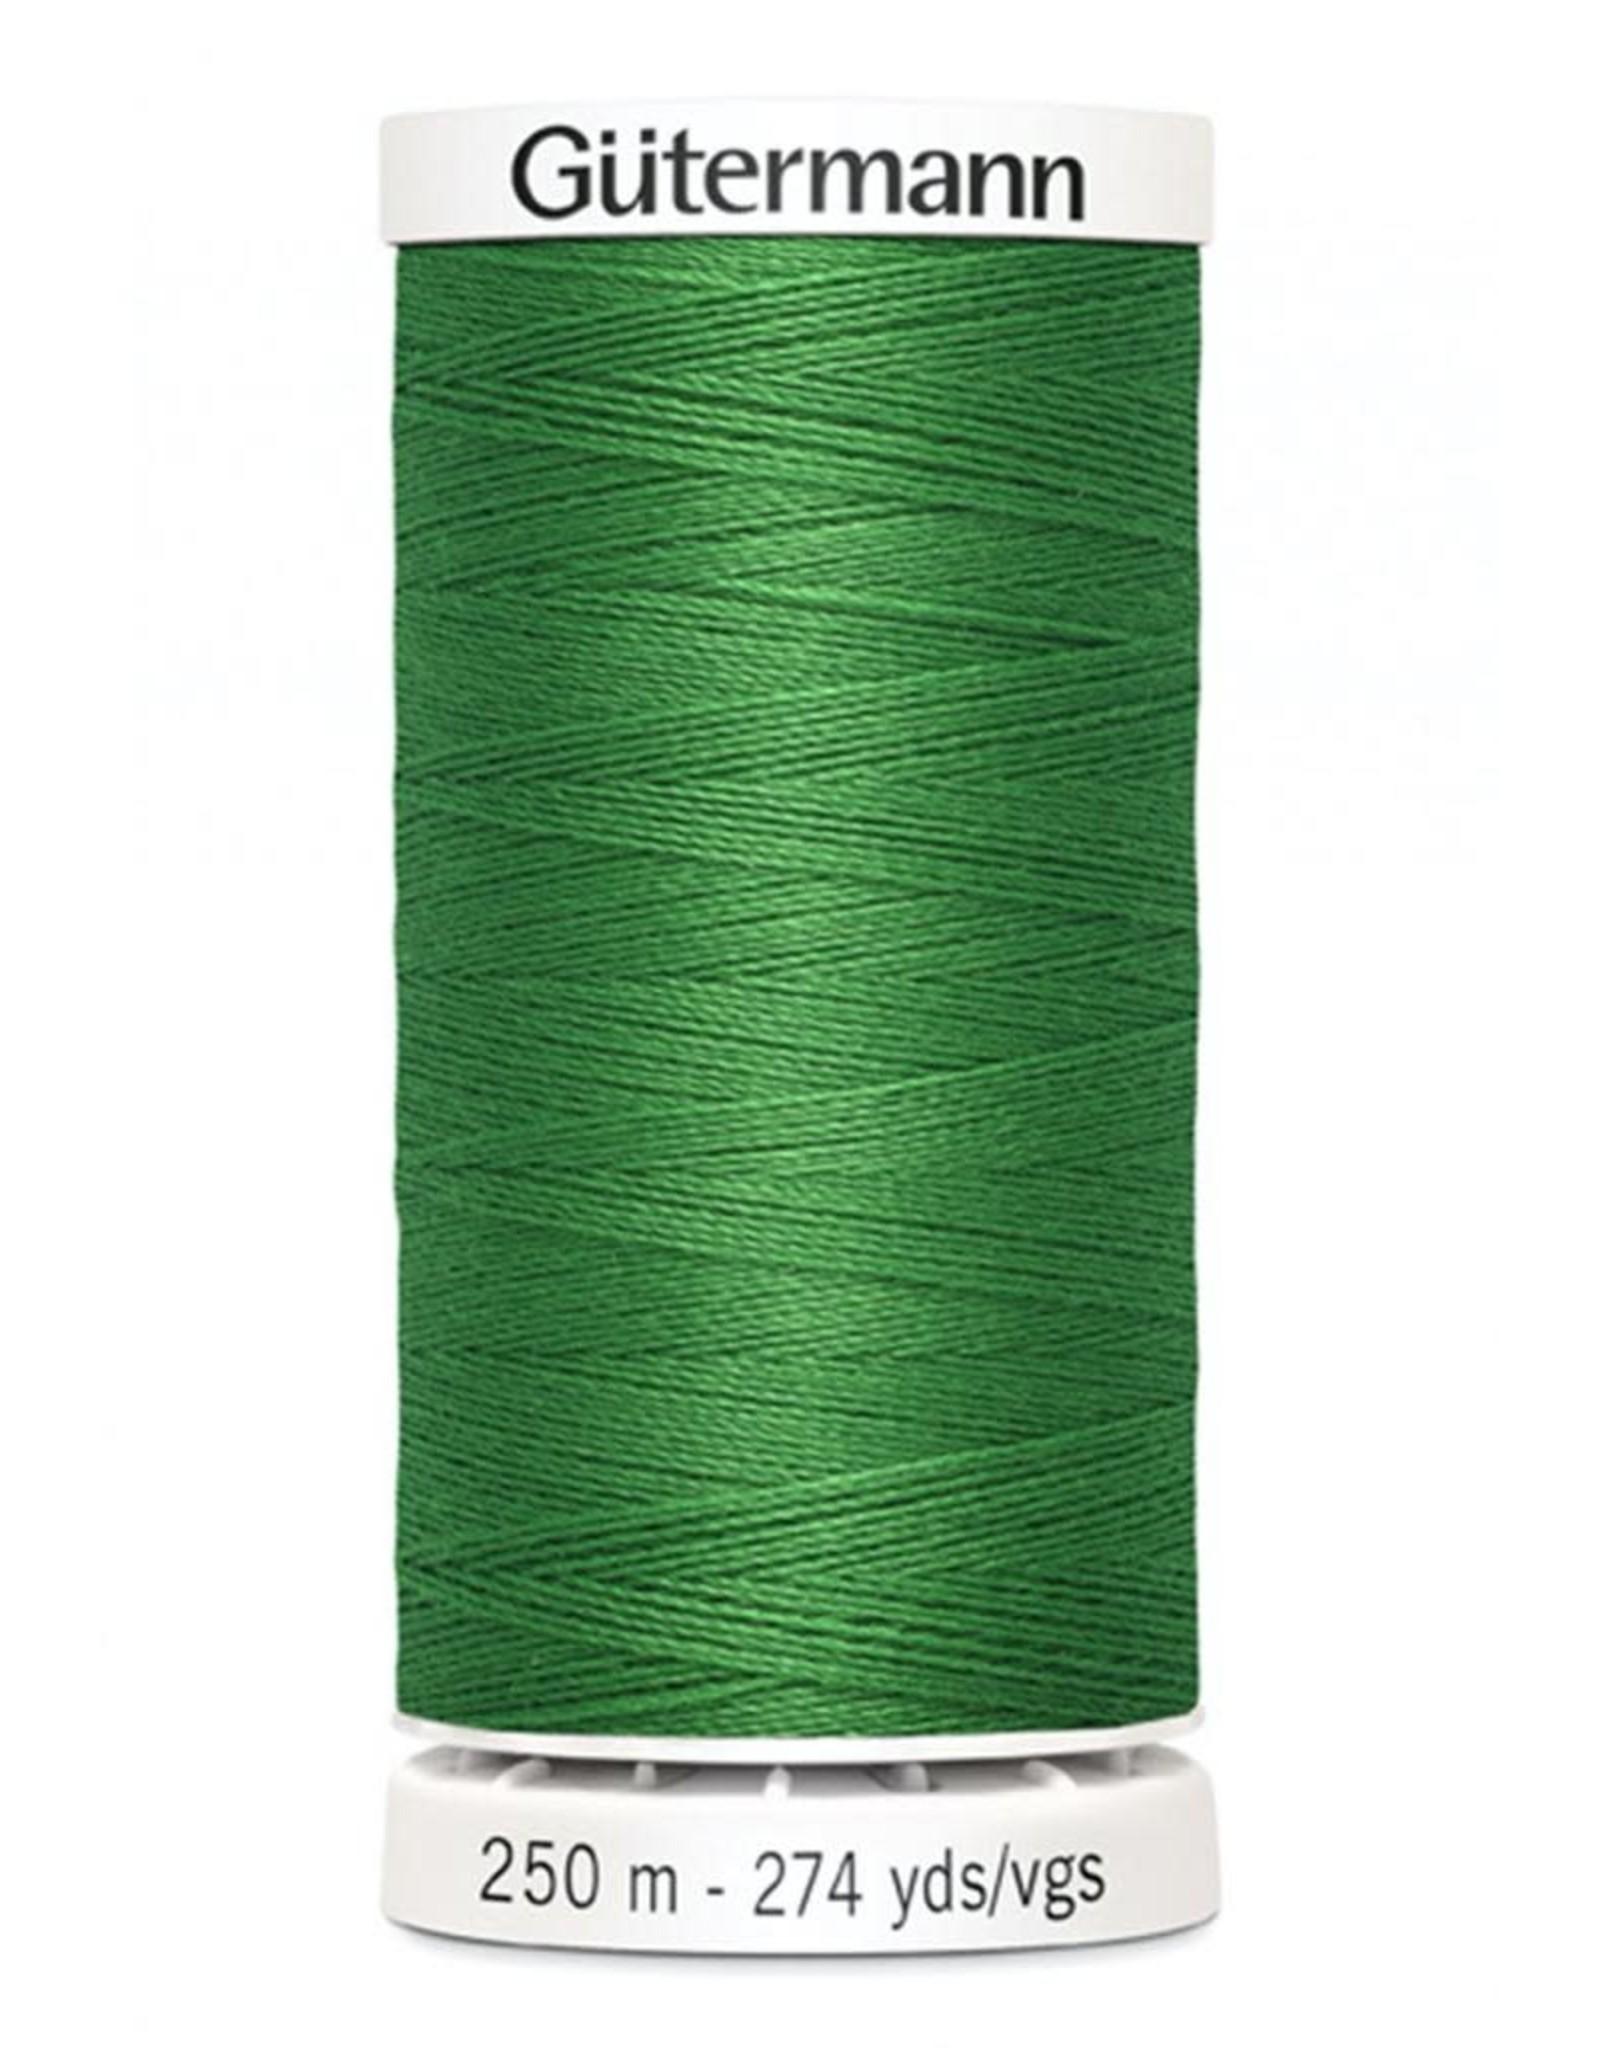 Gutermann Gutermann Thread, 250M-760 Kelly Green, Sew-All Polyester All Purpose Thread, 250m/273yds